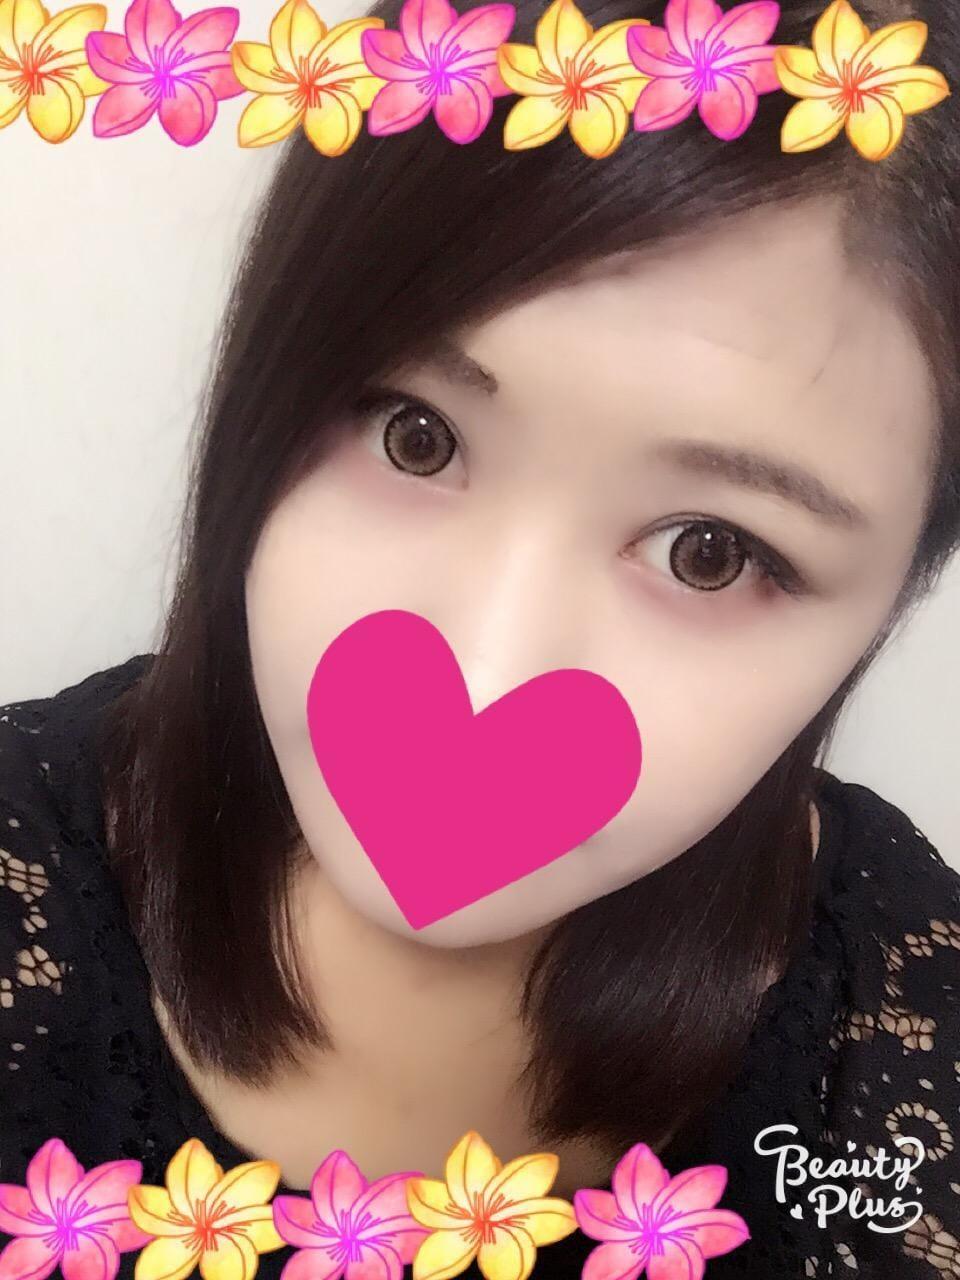 「February 17th ★」02/17日(土) 17:49 | まどかの写メ・風俗動画